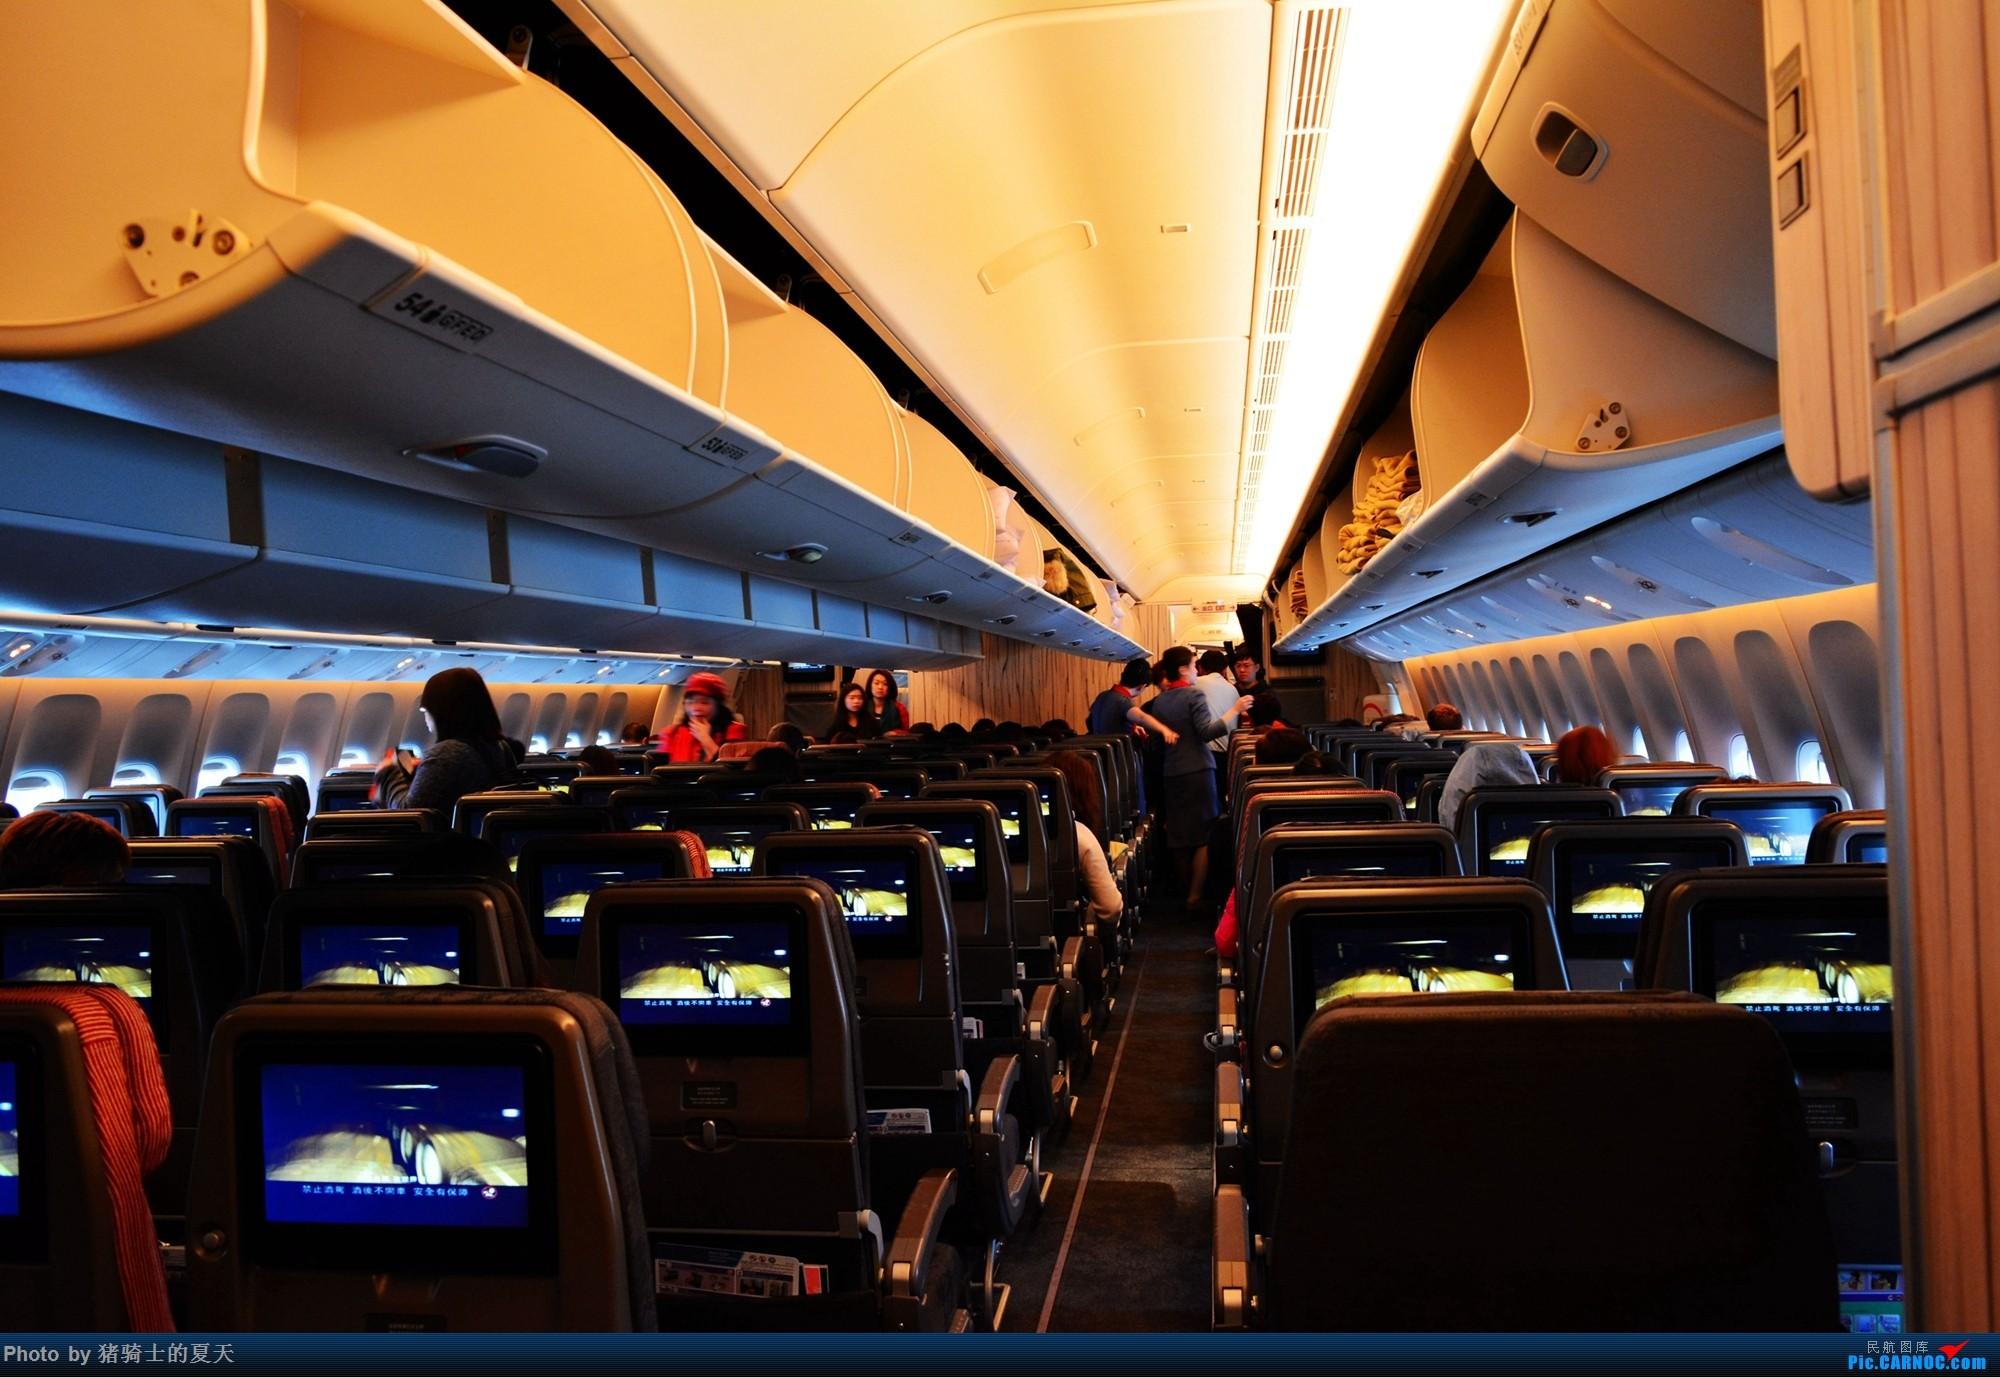 Re:[原创]2017年鸡鸭图 BOEING 777-300ER B-18053 中国台北桃园国际机场